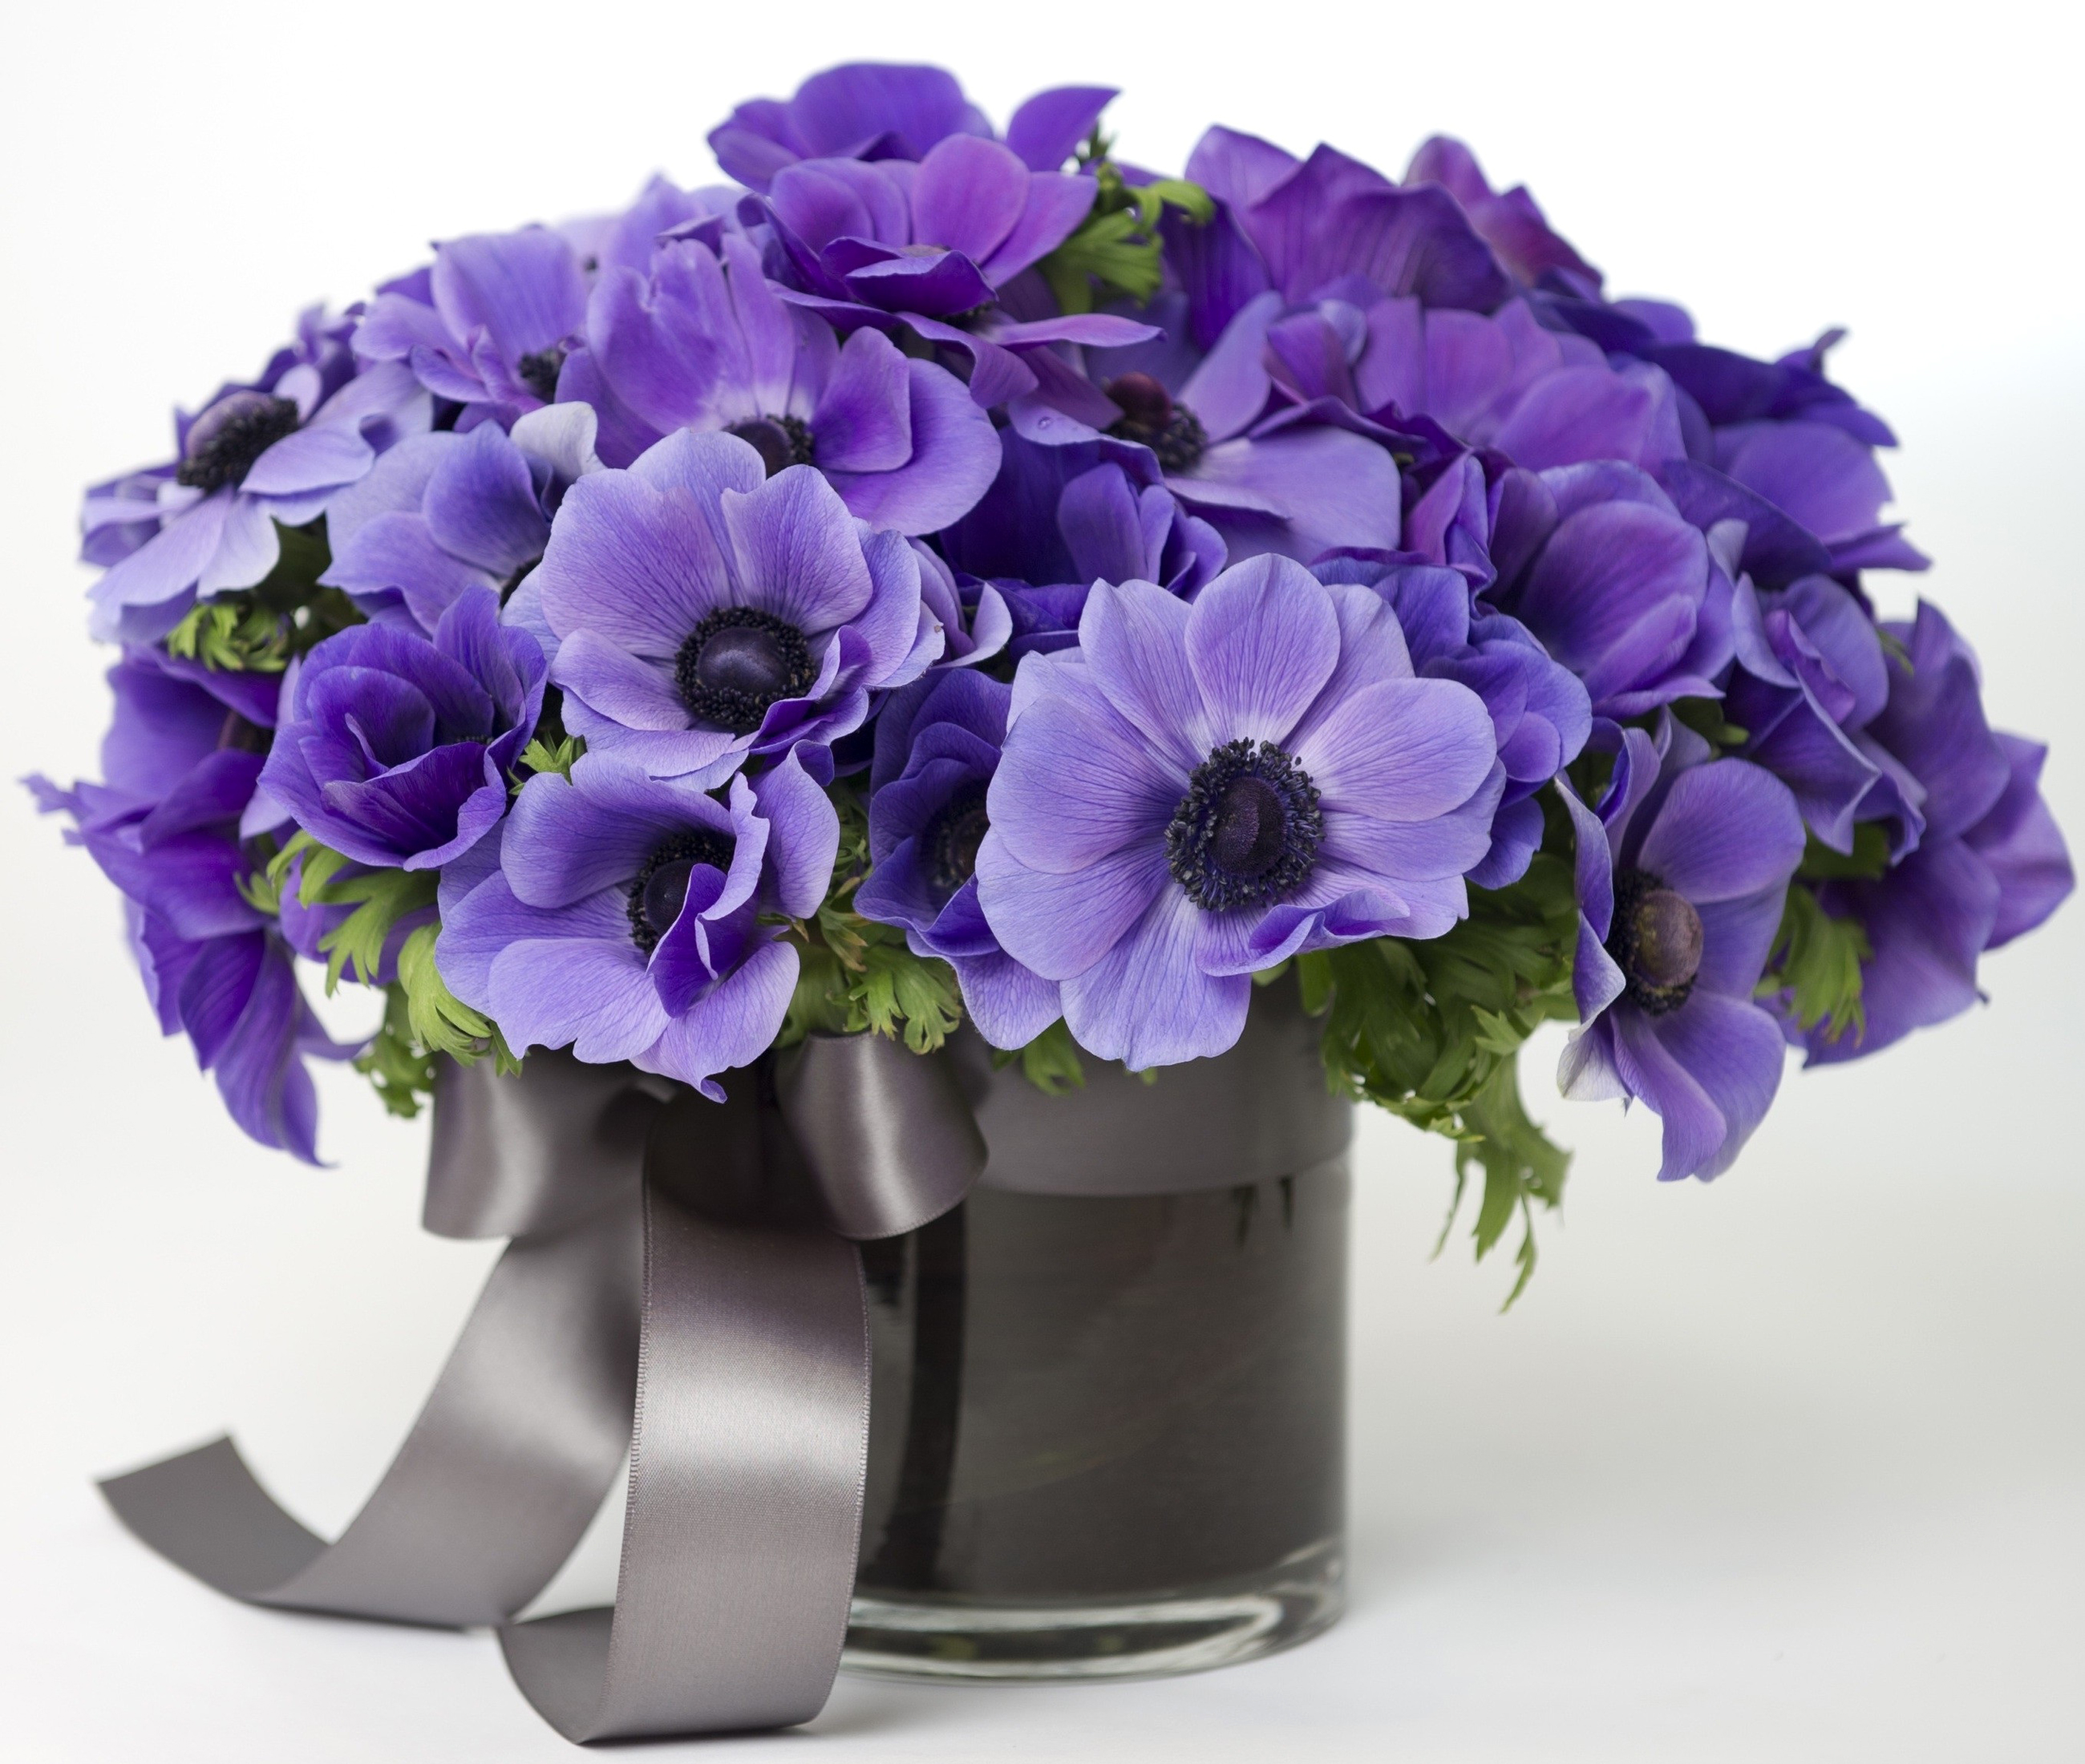 Bouquets_Anemones_Vase_465980.jpg